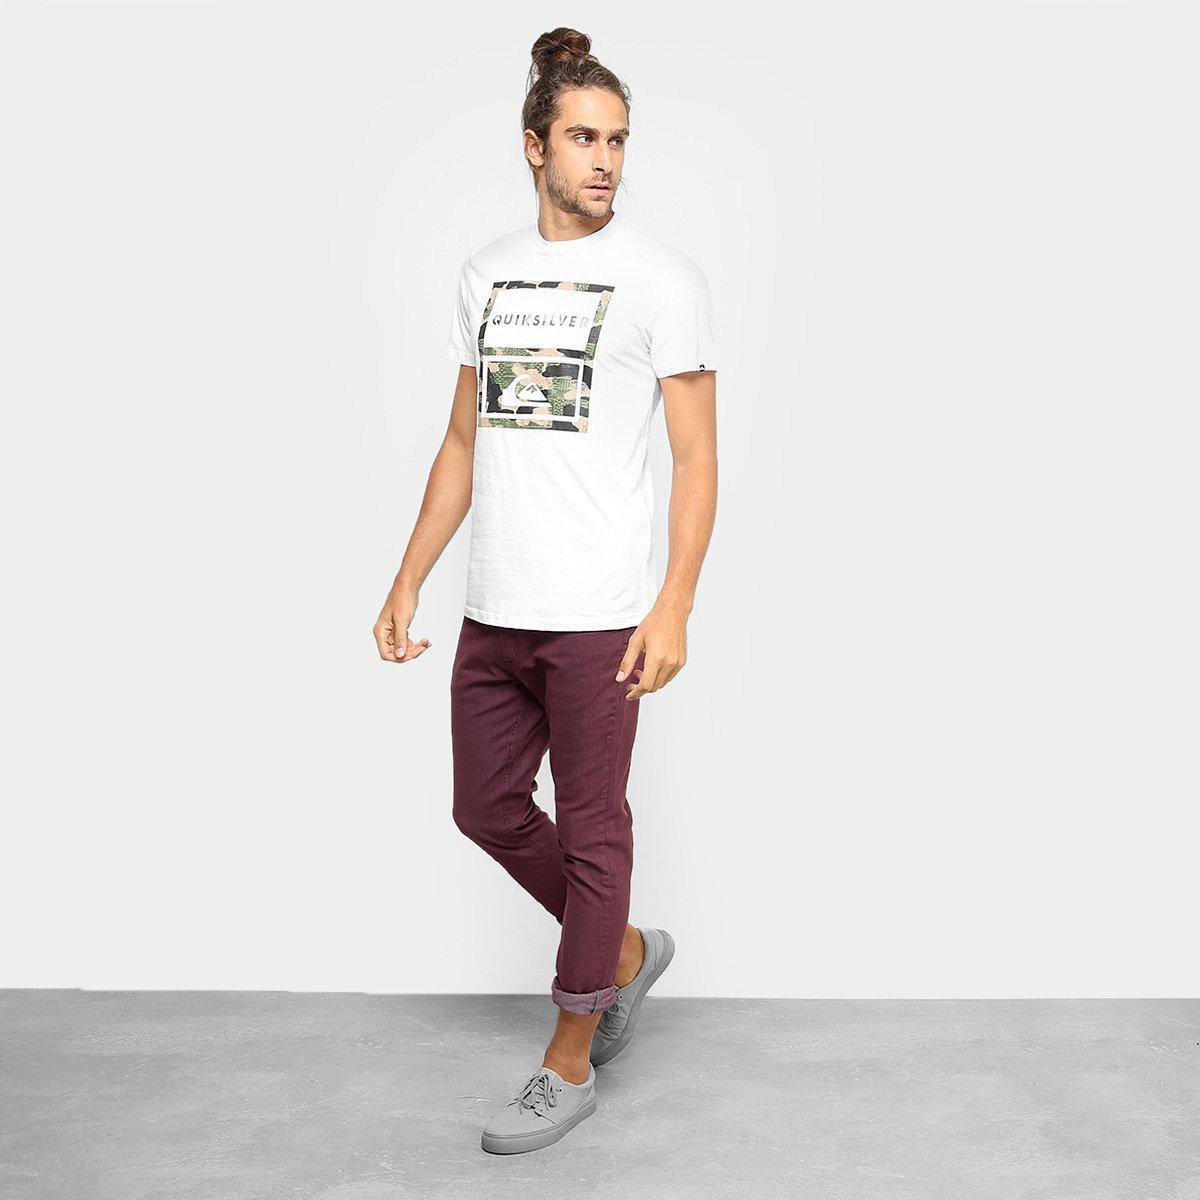 776aeb7719363 Camiseta Quiksilver Hawaii Camo Masculina - Compre Agora   Zattini